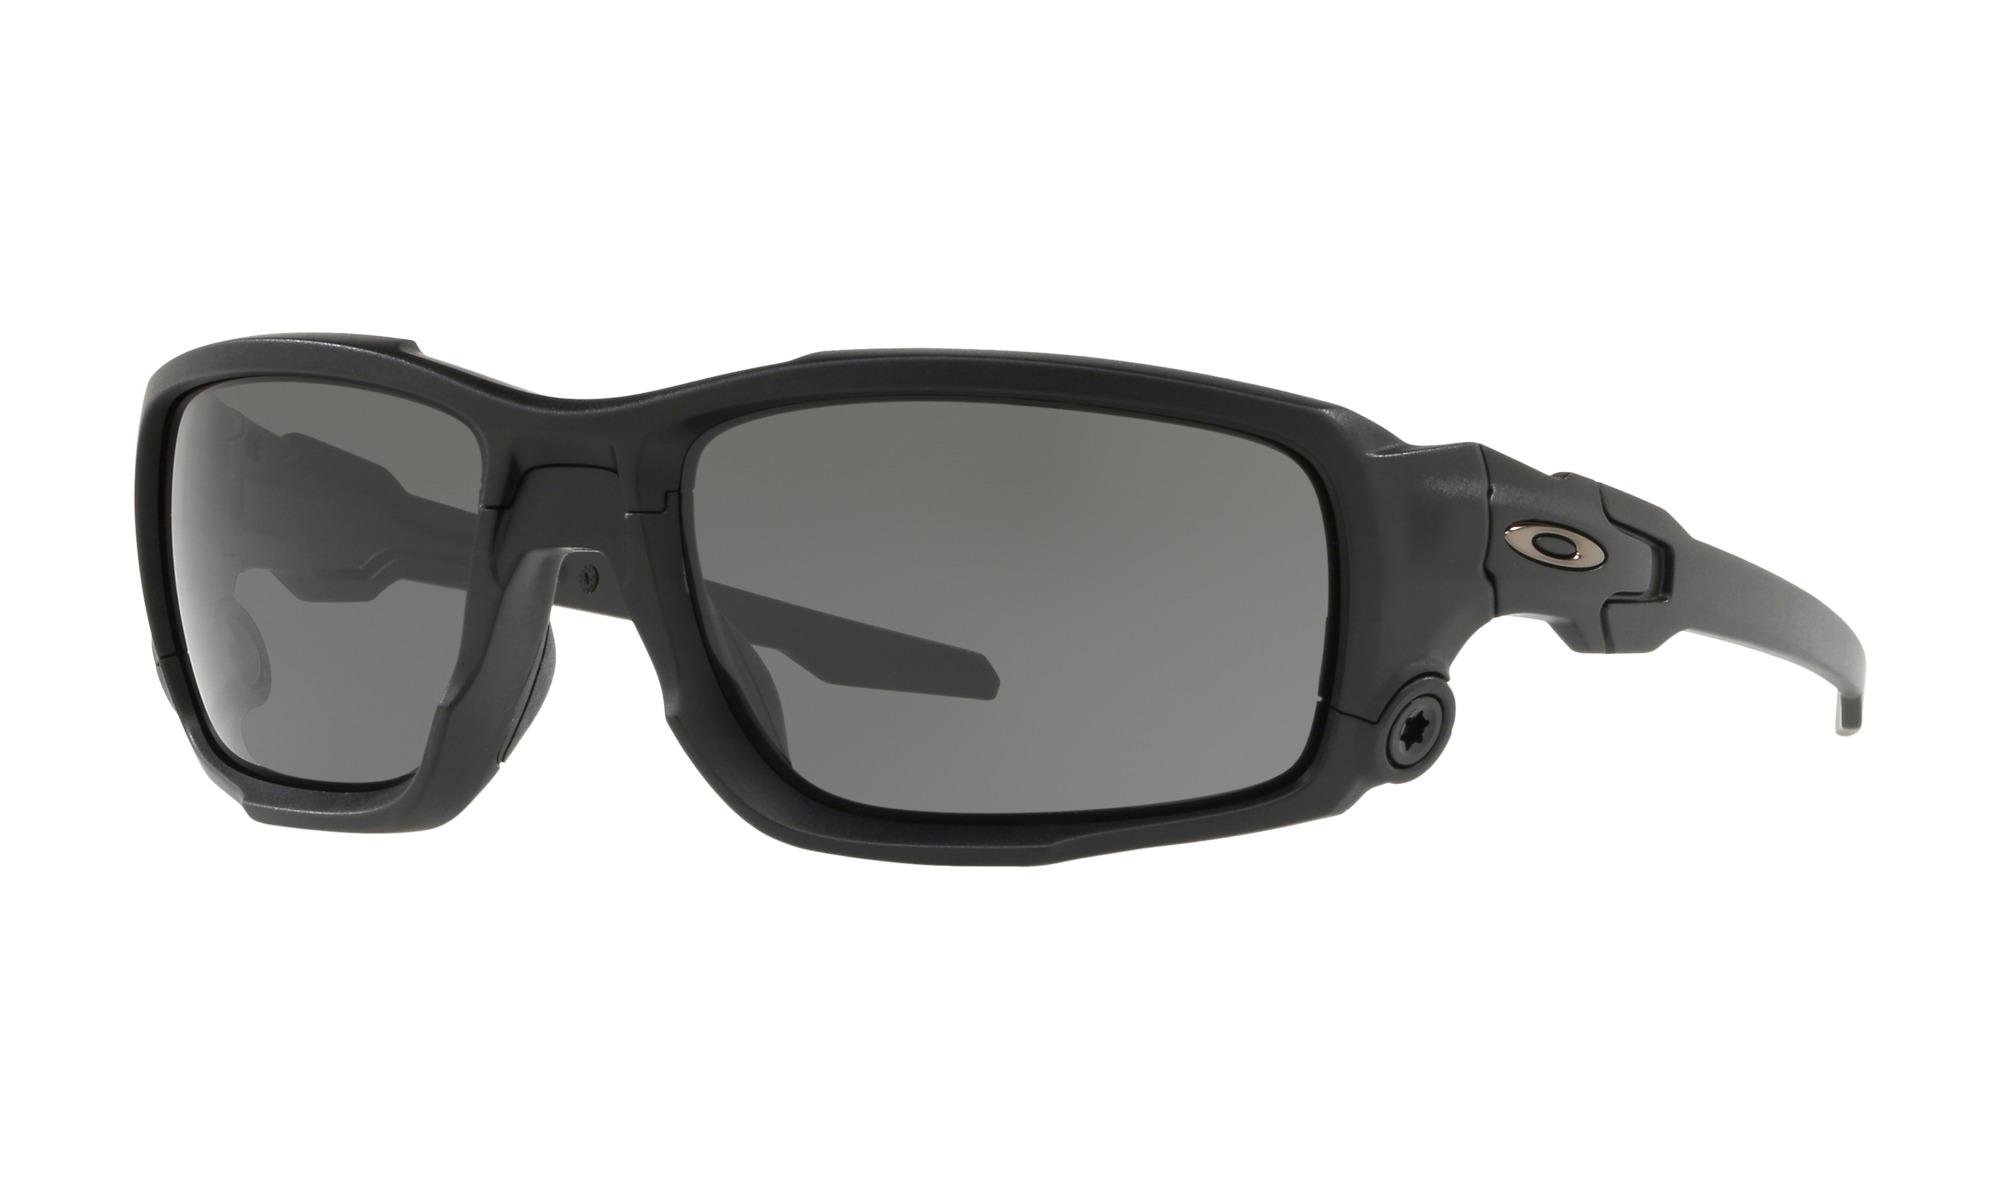 8f7c24db5ccf9 Oakley SI BALLISTIC SHOCKTUBE OO9329 Sunglasses FREE S H OO9329-932902-61